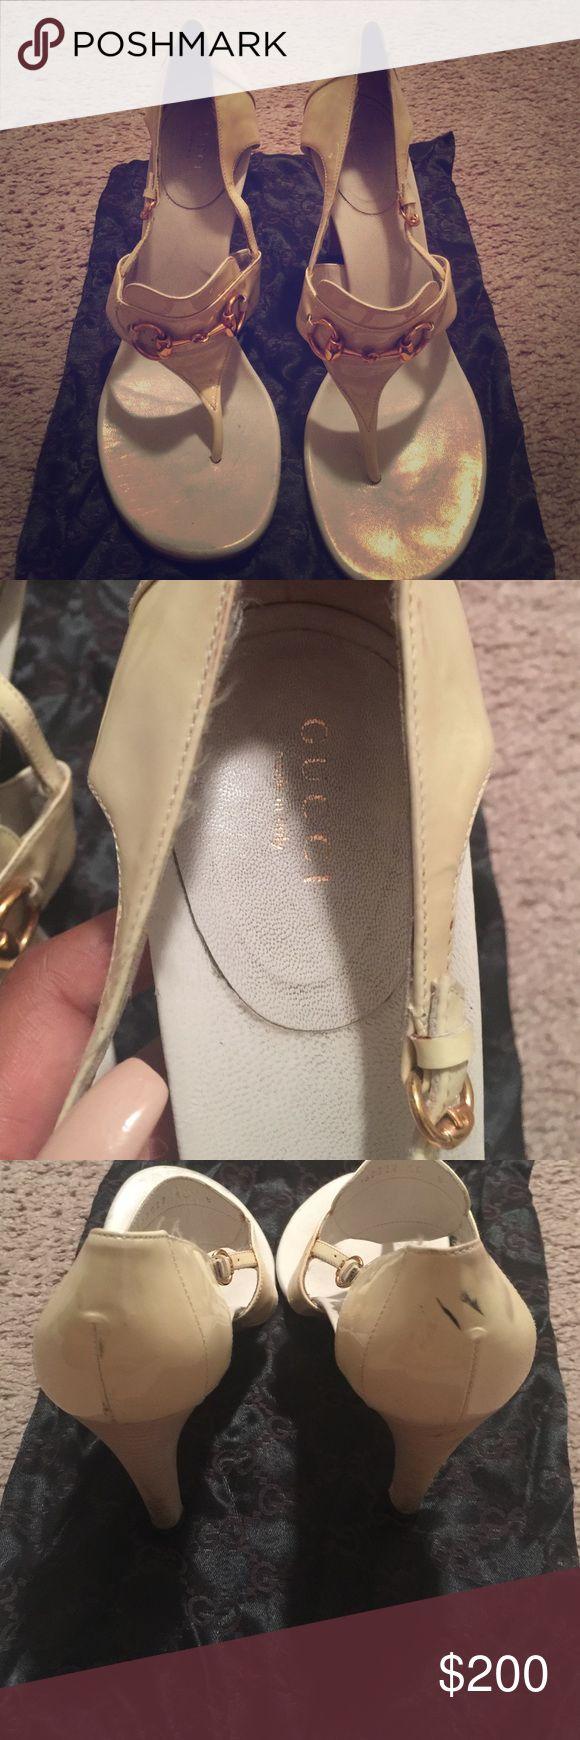 Gucci shoes Gucci, size 10, ivory sandals Gucci Shoes Sandals